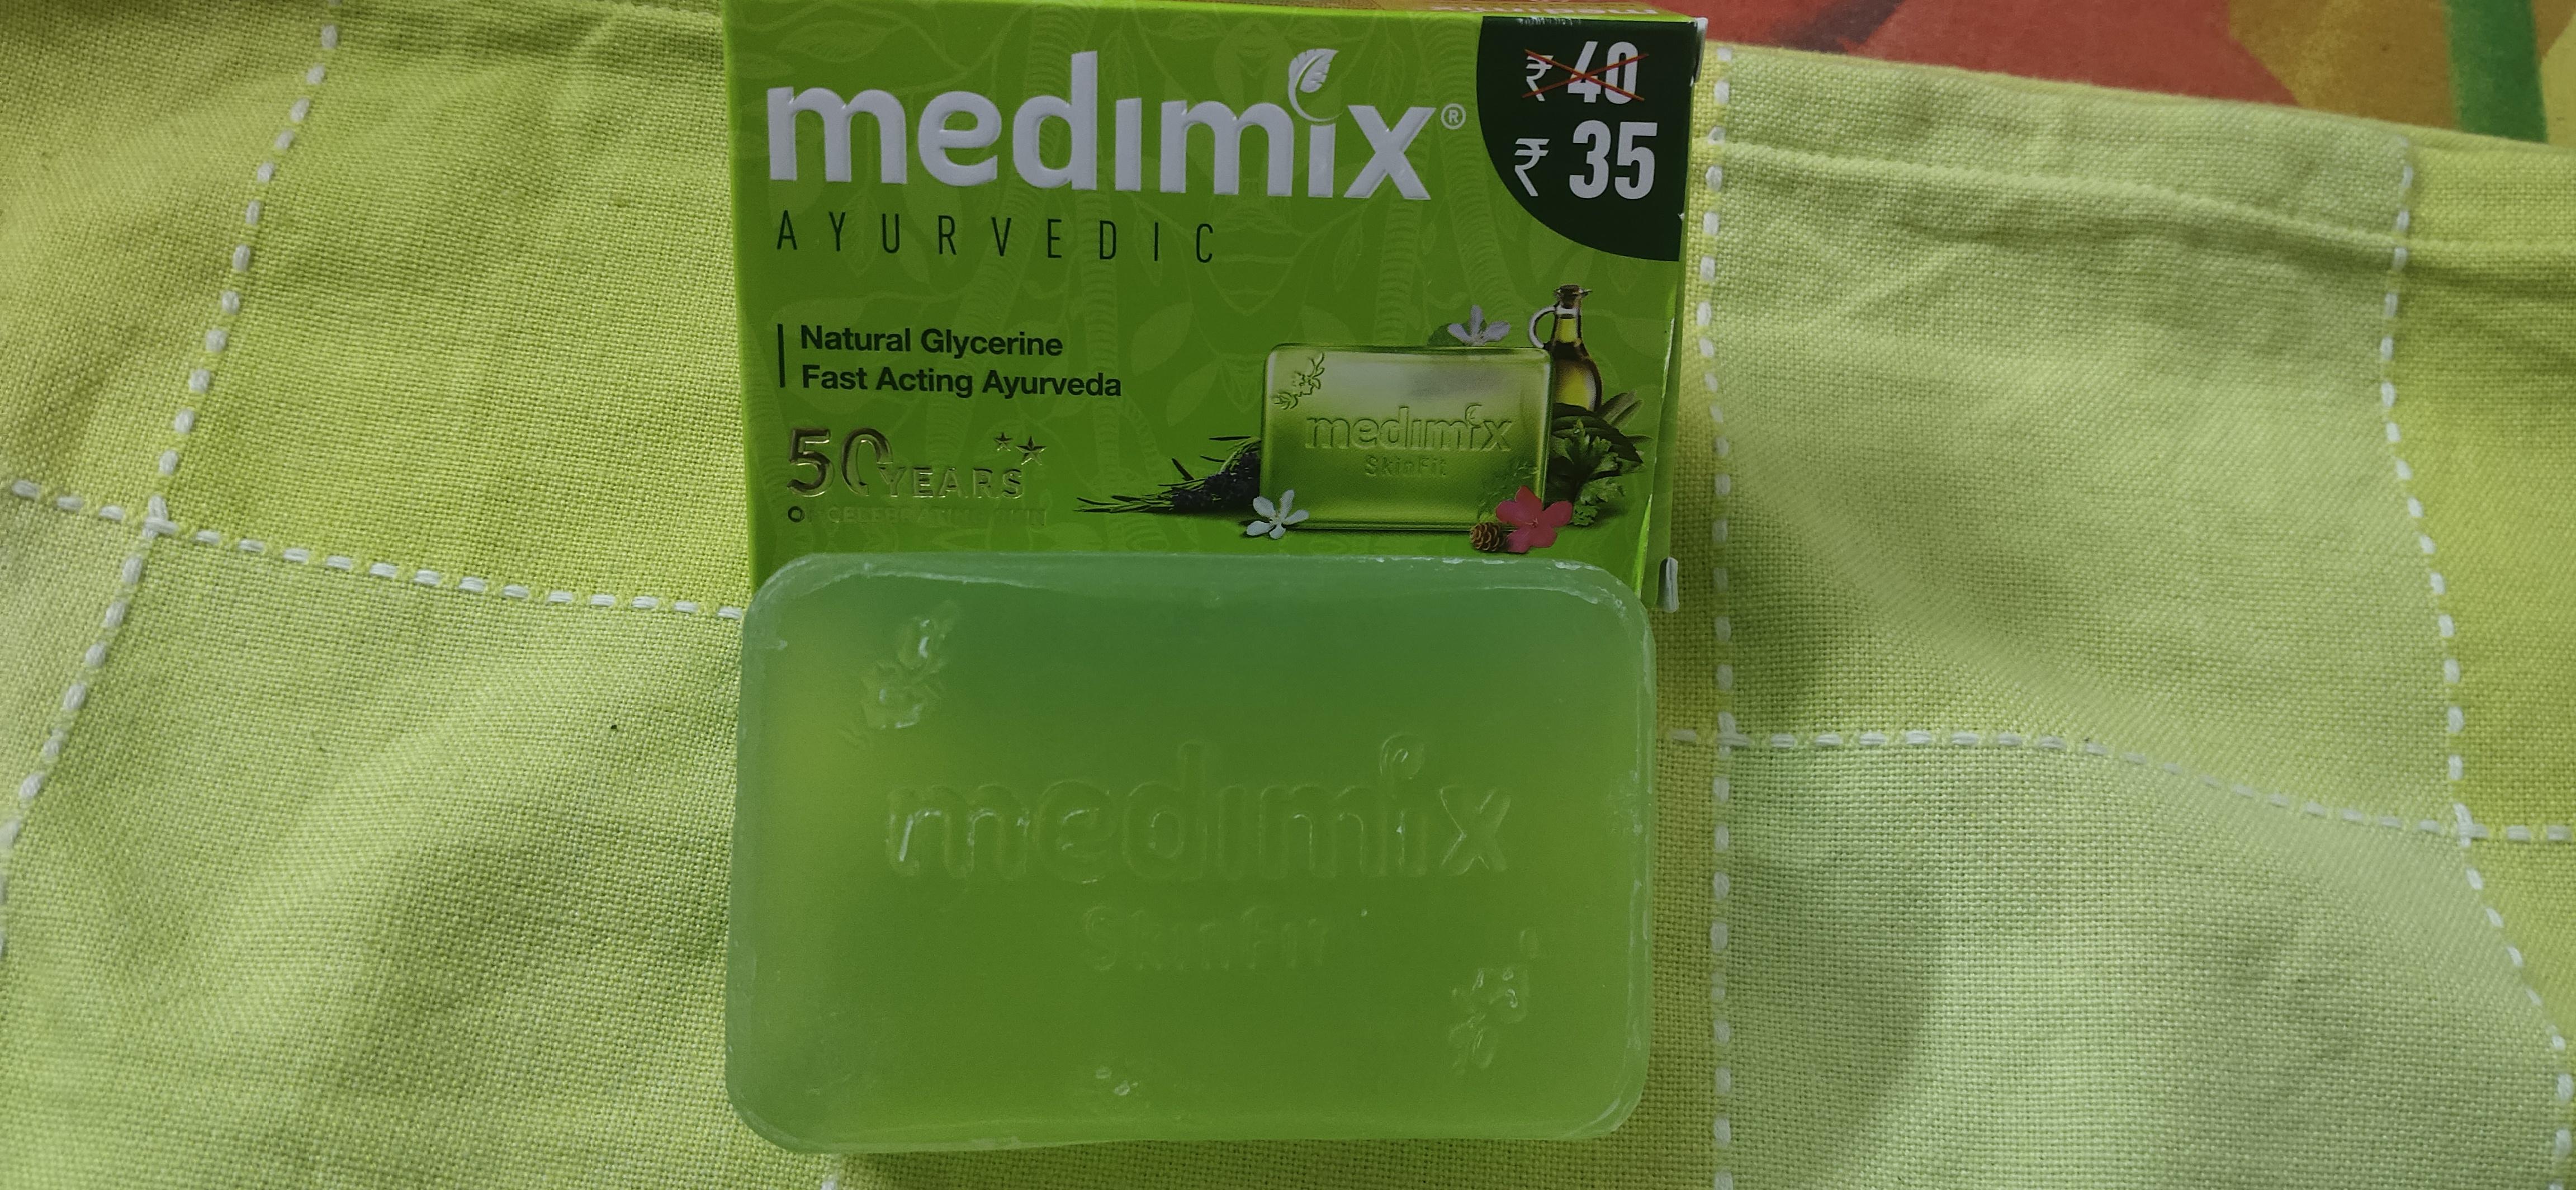 Medimix Ayurvedic Natural Glycerine soap with Lakshadi Oil pic 1-Super effective-By srishti10